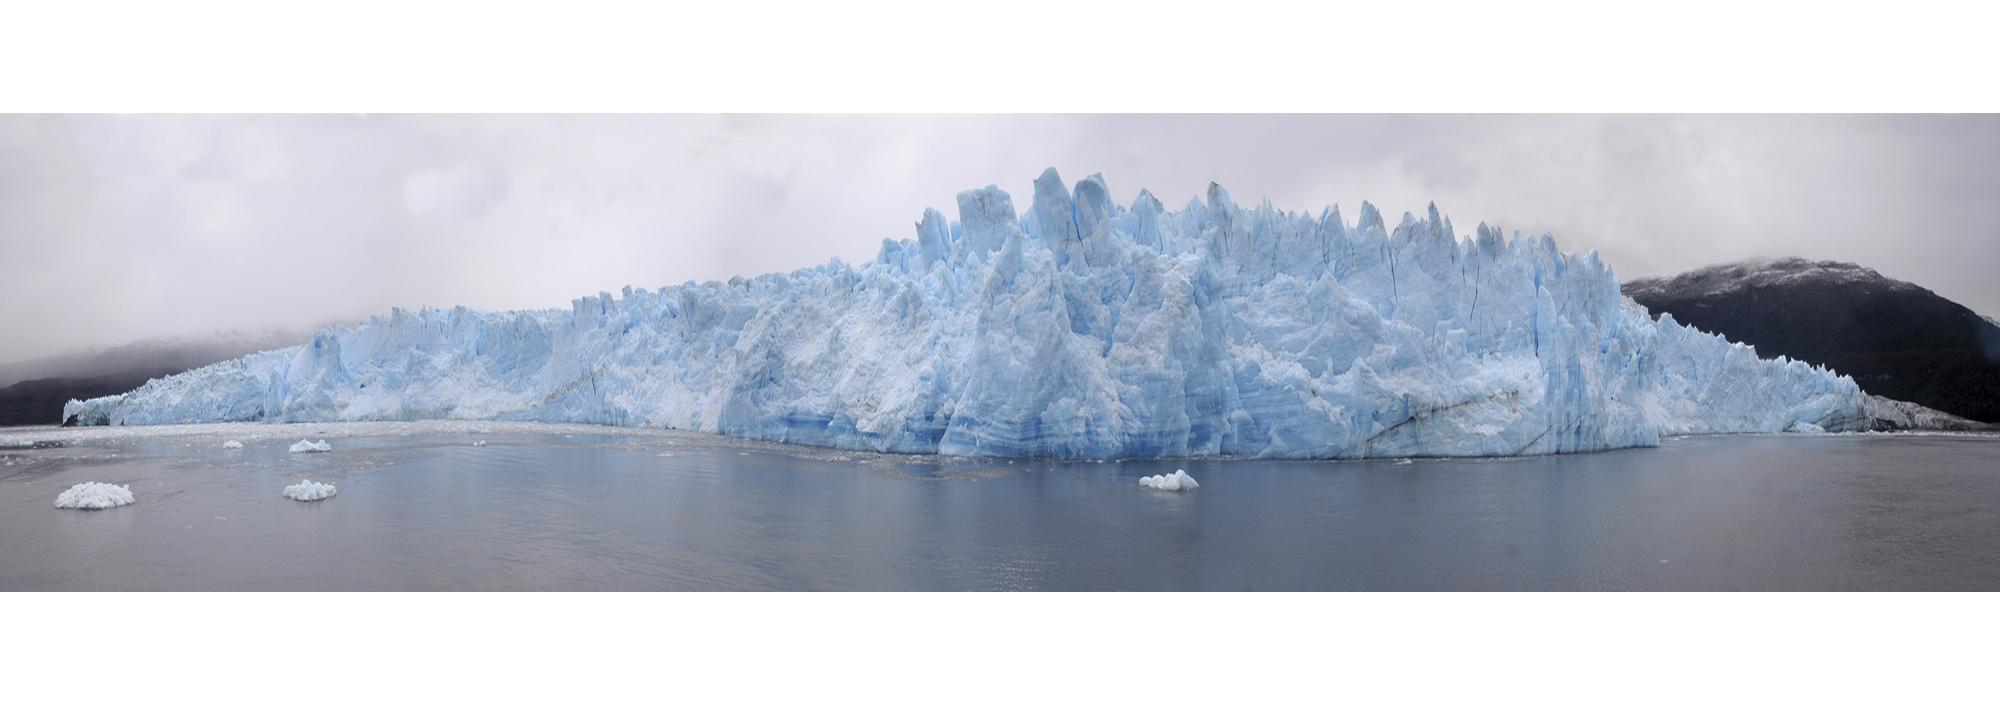 Glaciar Pio XI. Campos Hielo, Chile